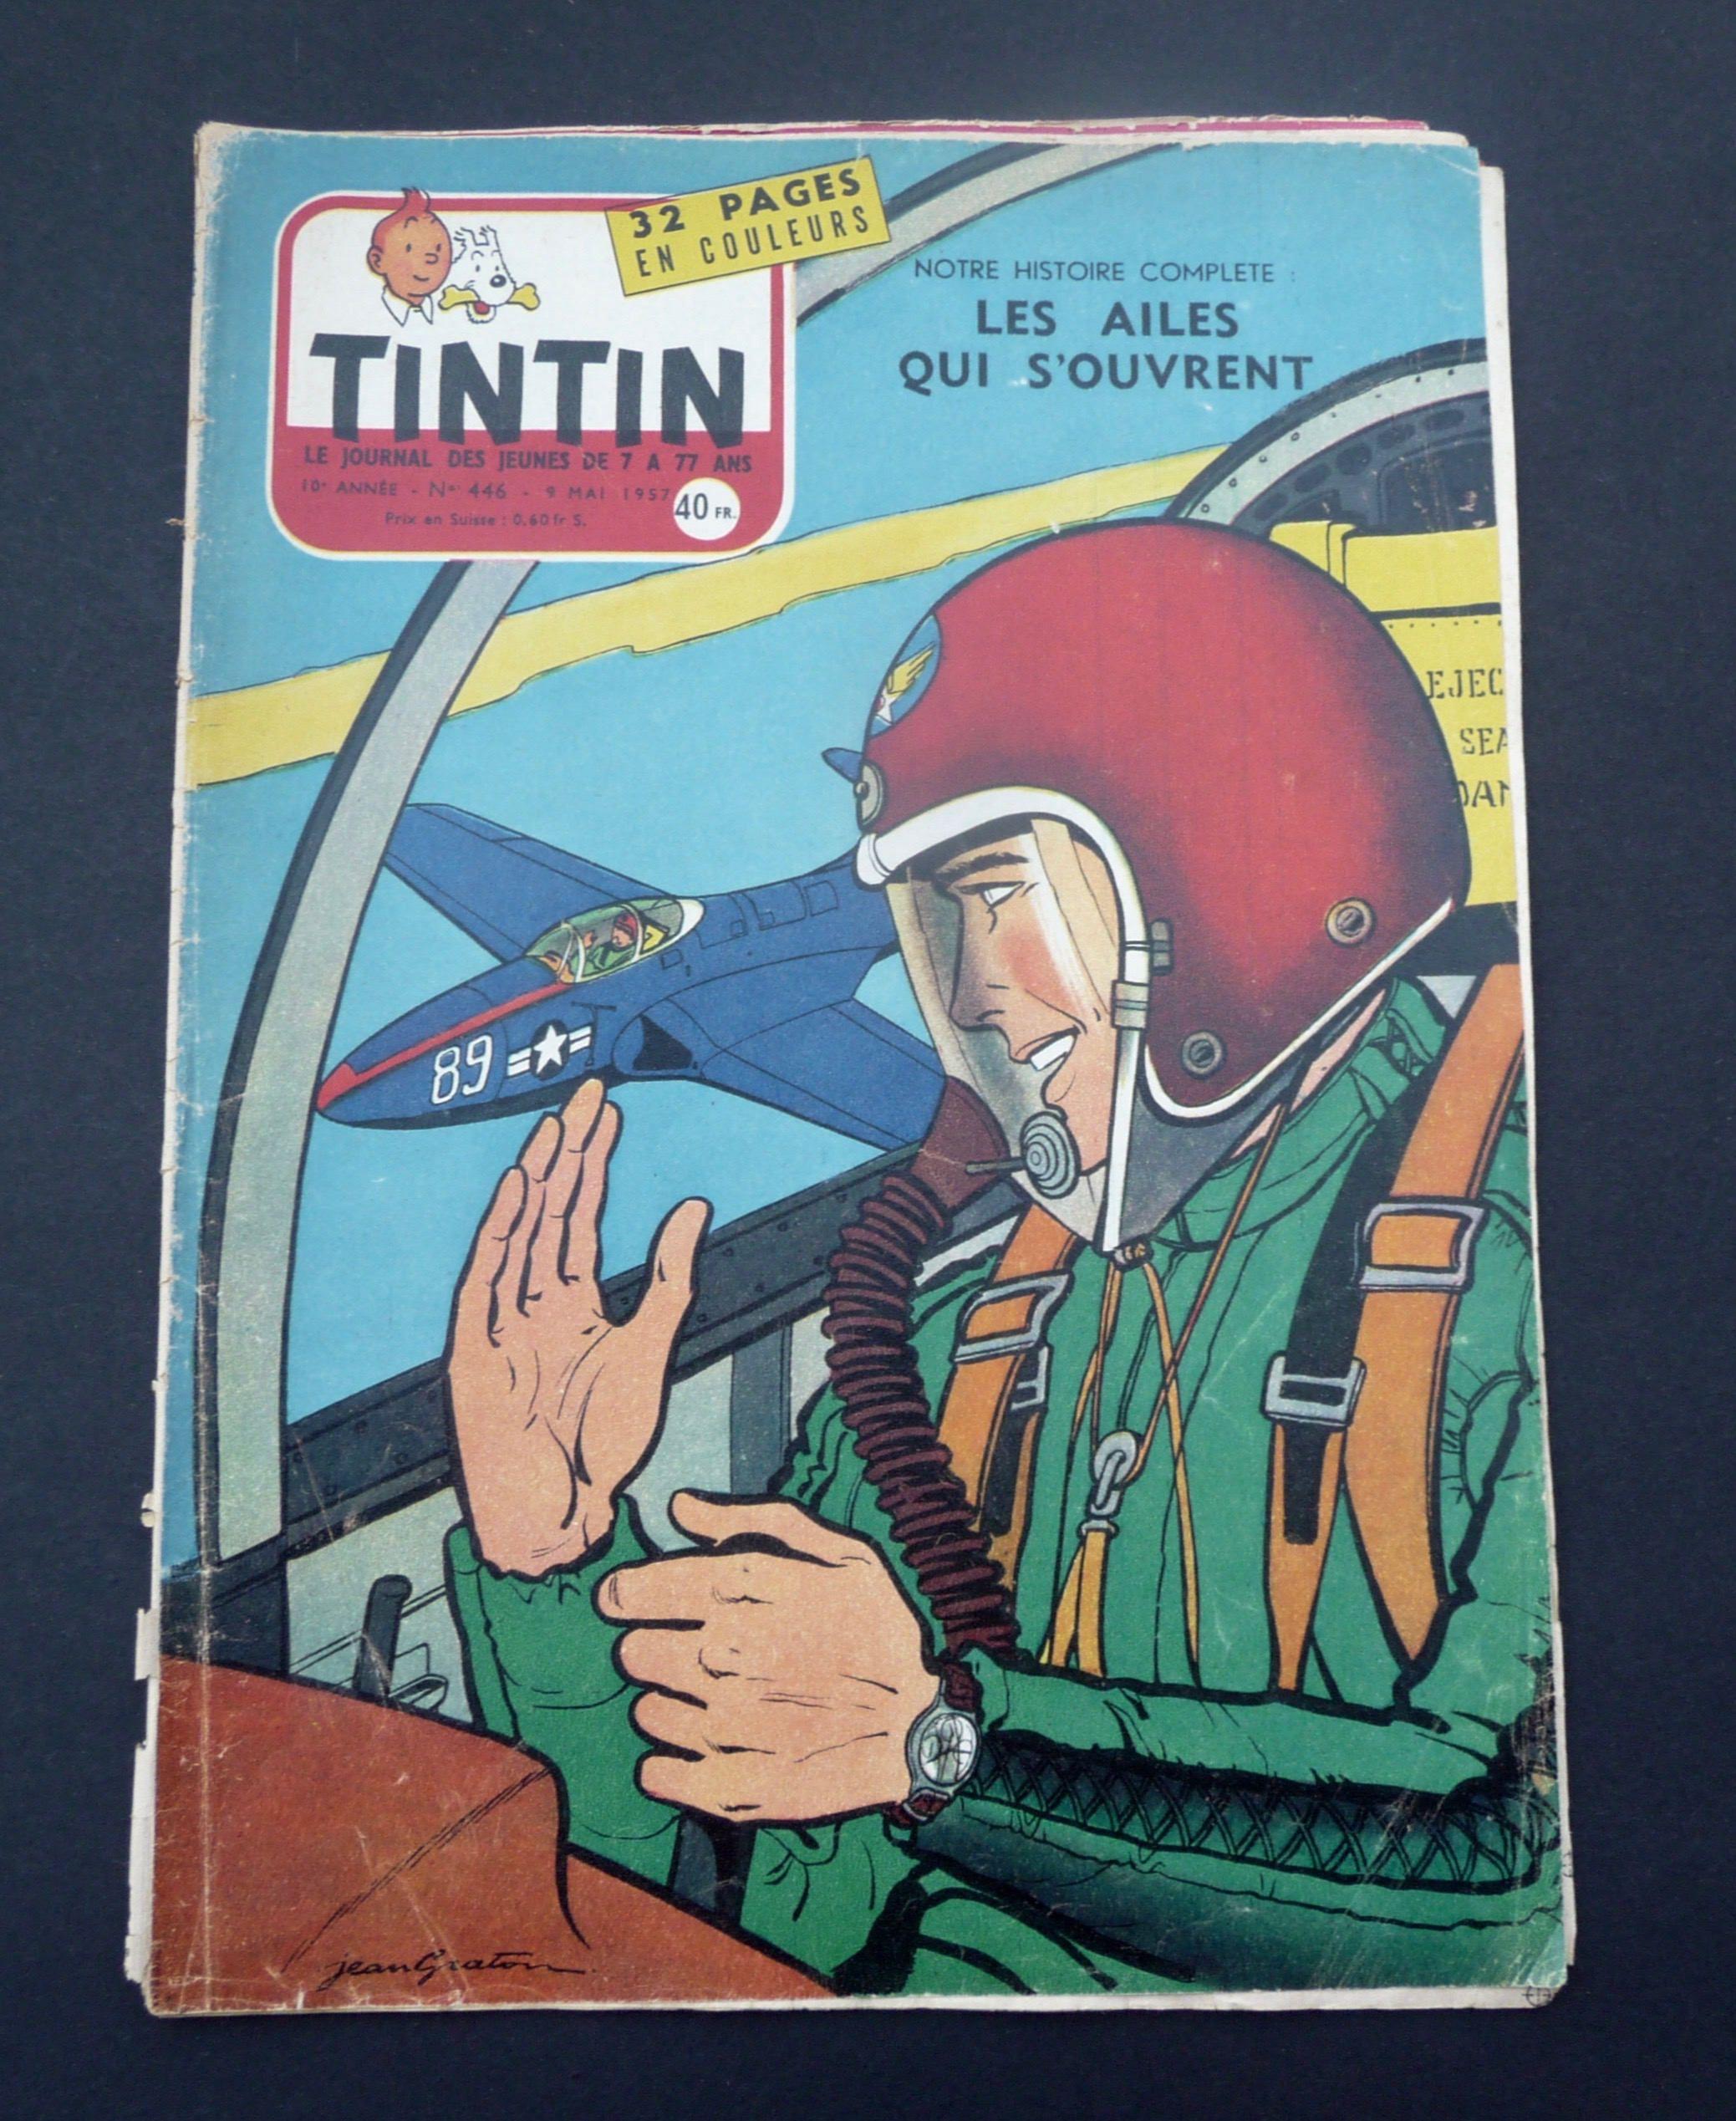 Journal Tintin 10e Annee N 446 9 Mai 1957 Edition Etsy Tintin Comic Books Comic Book Cover